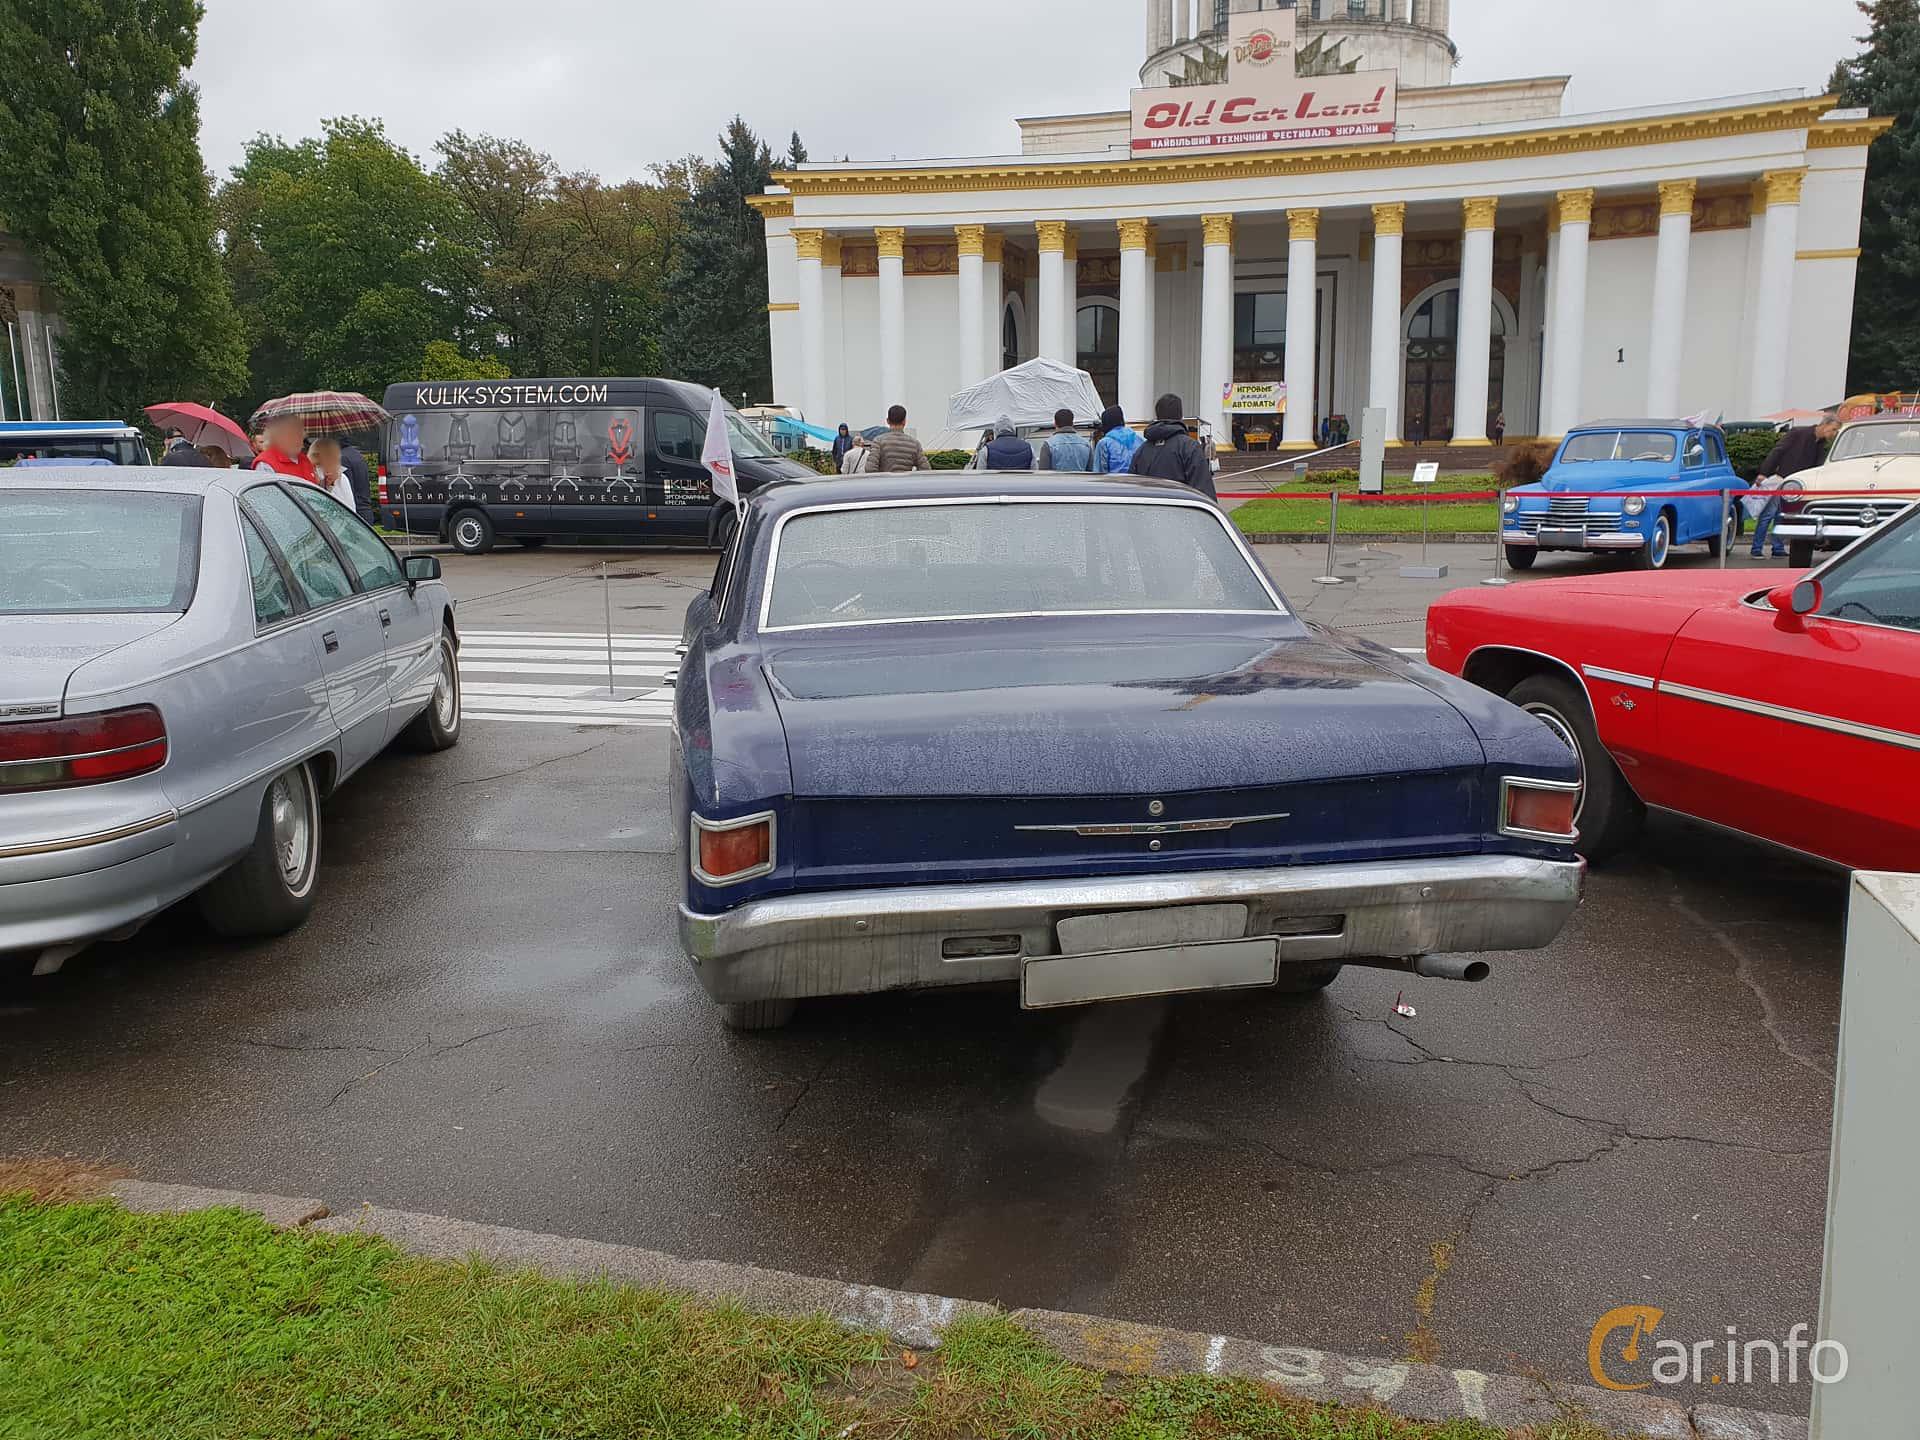 Chevrolet Chevelle 4-door Sedan 1967 at Old Car Land no.2 2018